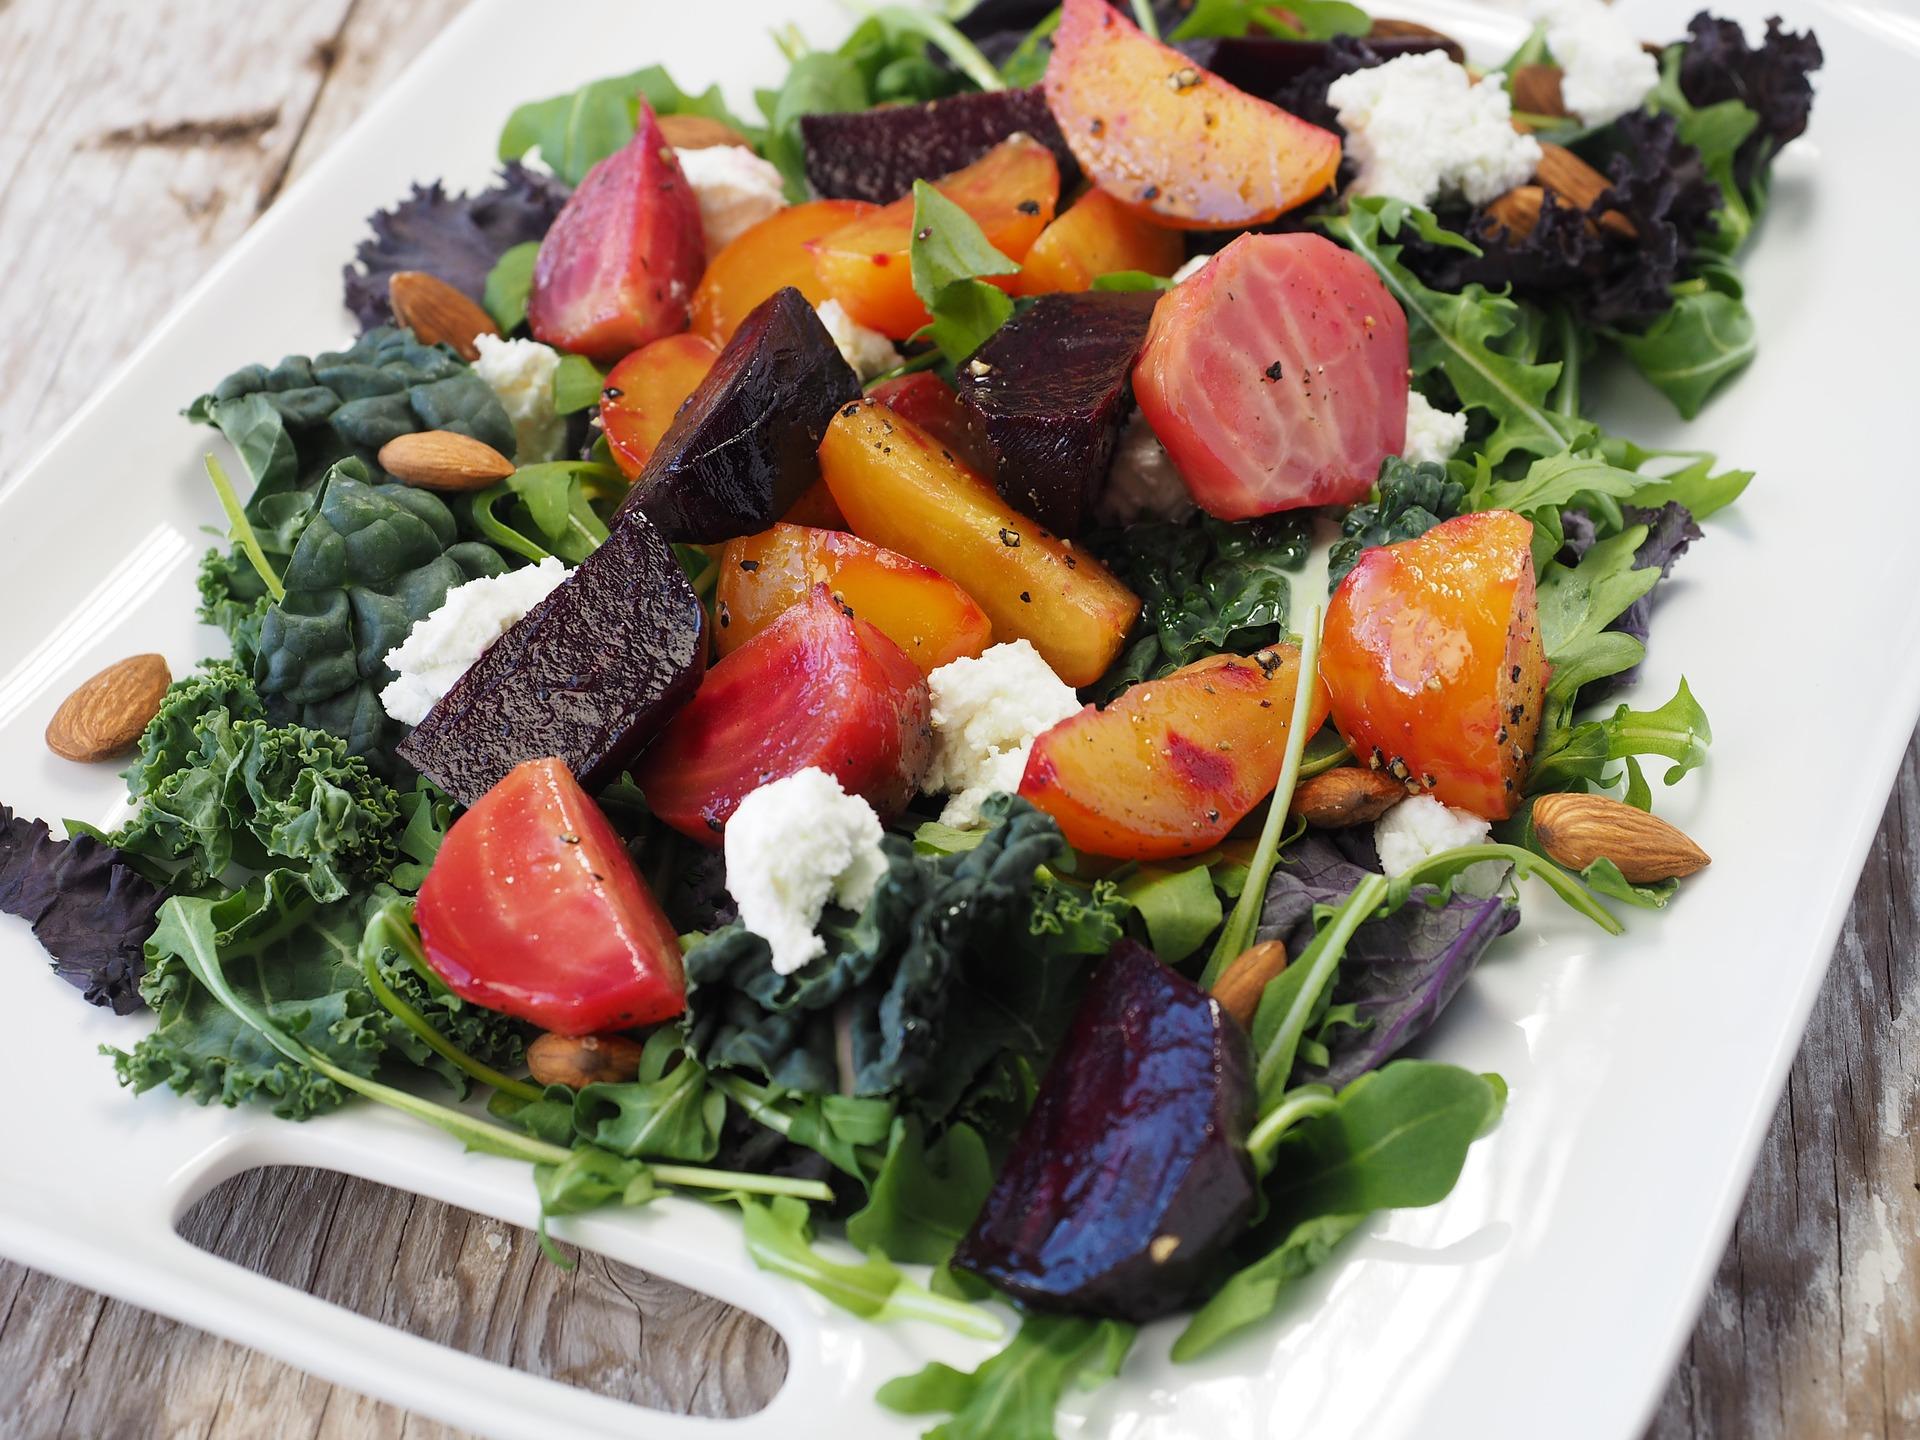 Image for Avocado & Golden Beet Salad